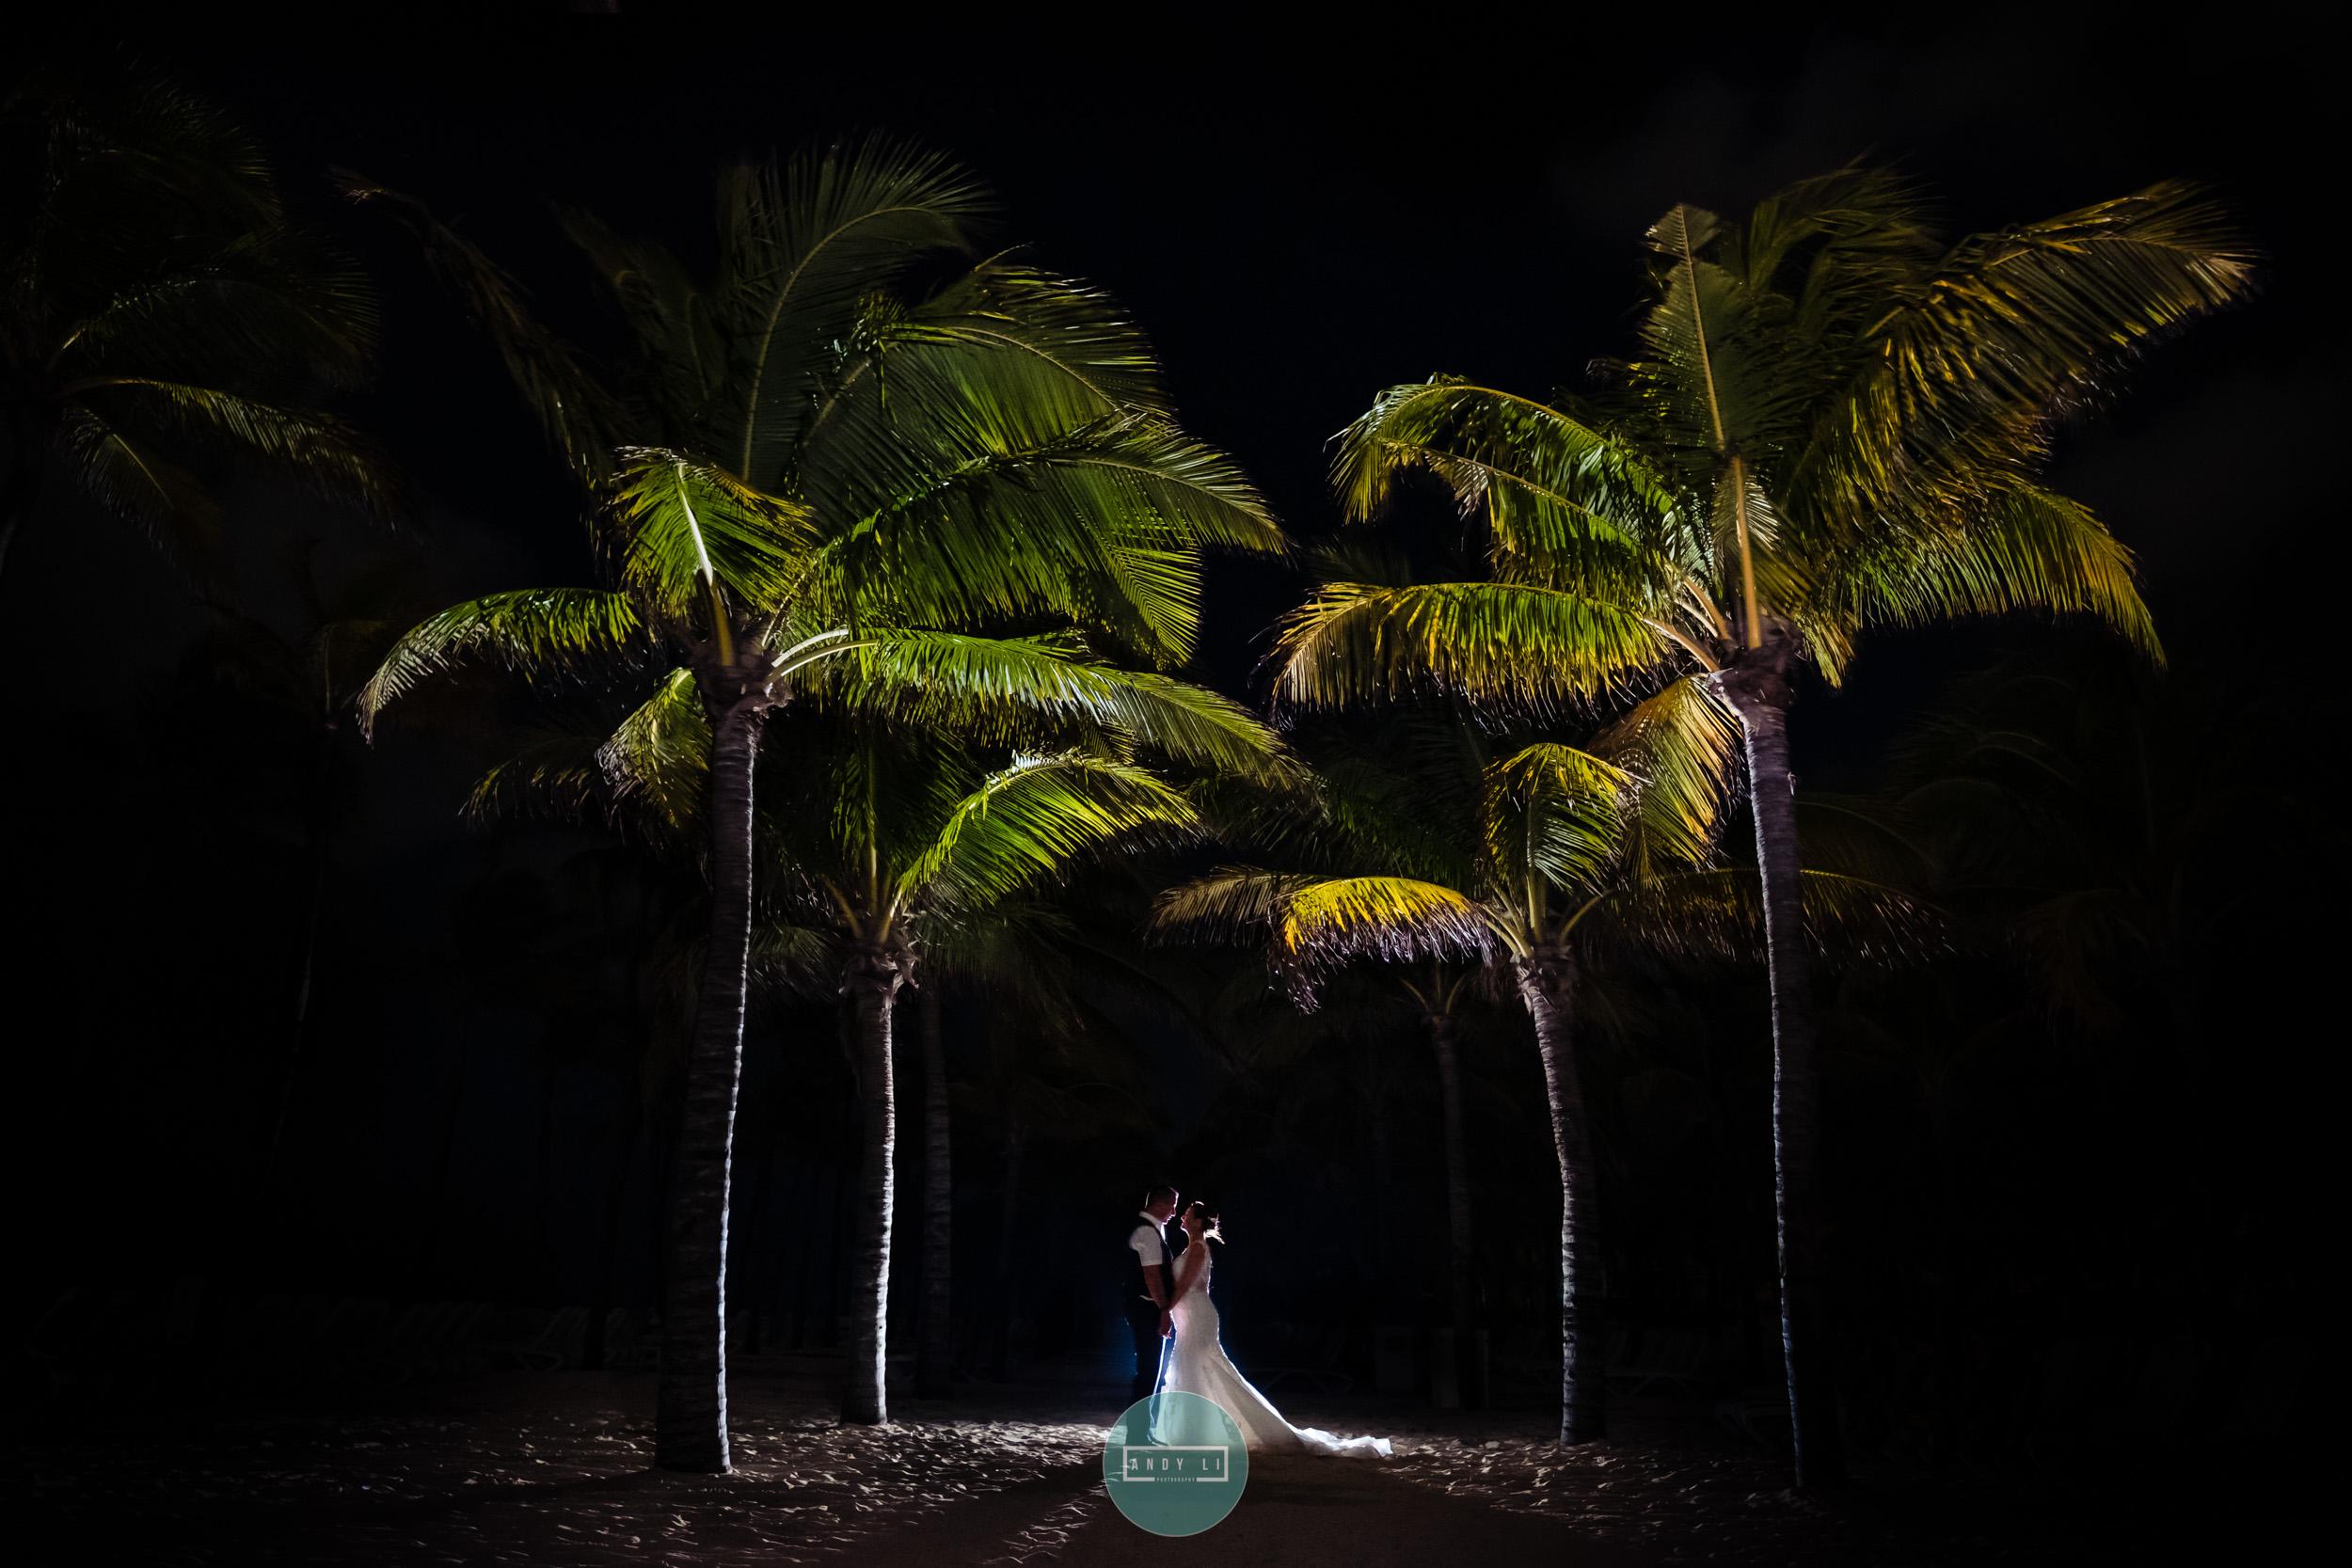 Playa del Carmen Mexico Wedding Photography-041-AXT23277-Edit.jpg